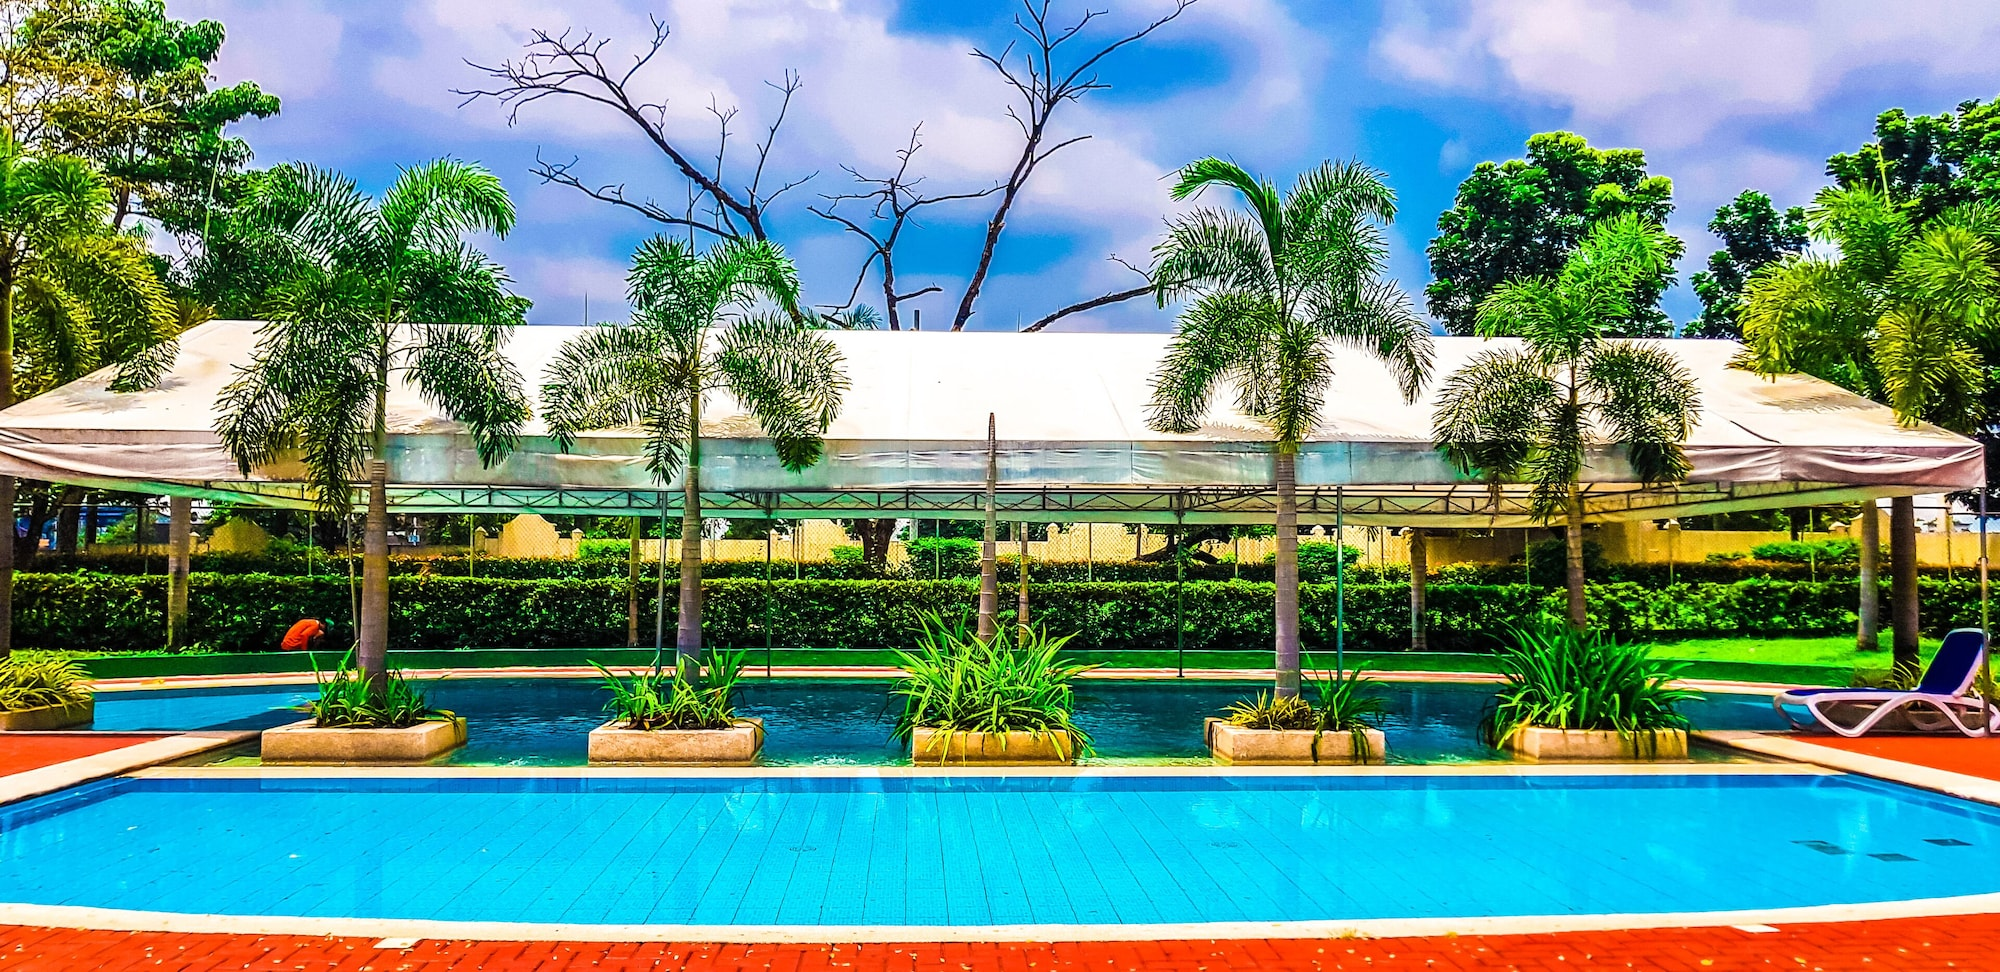 Sotogrande Neopolitan Hotel, Quezon City